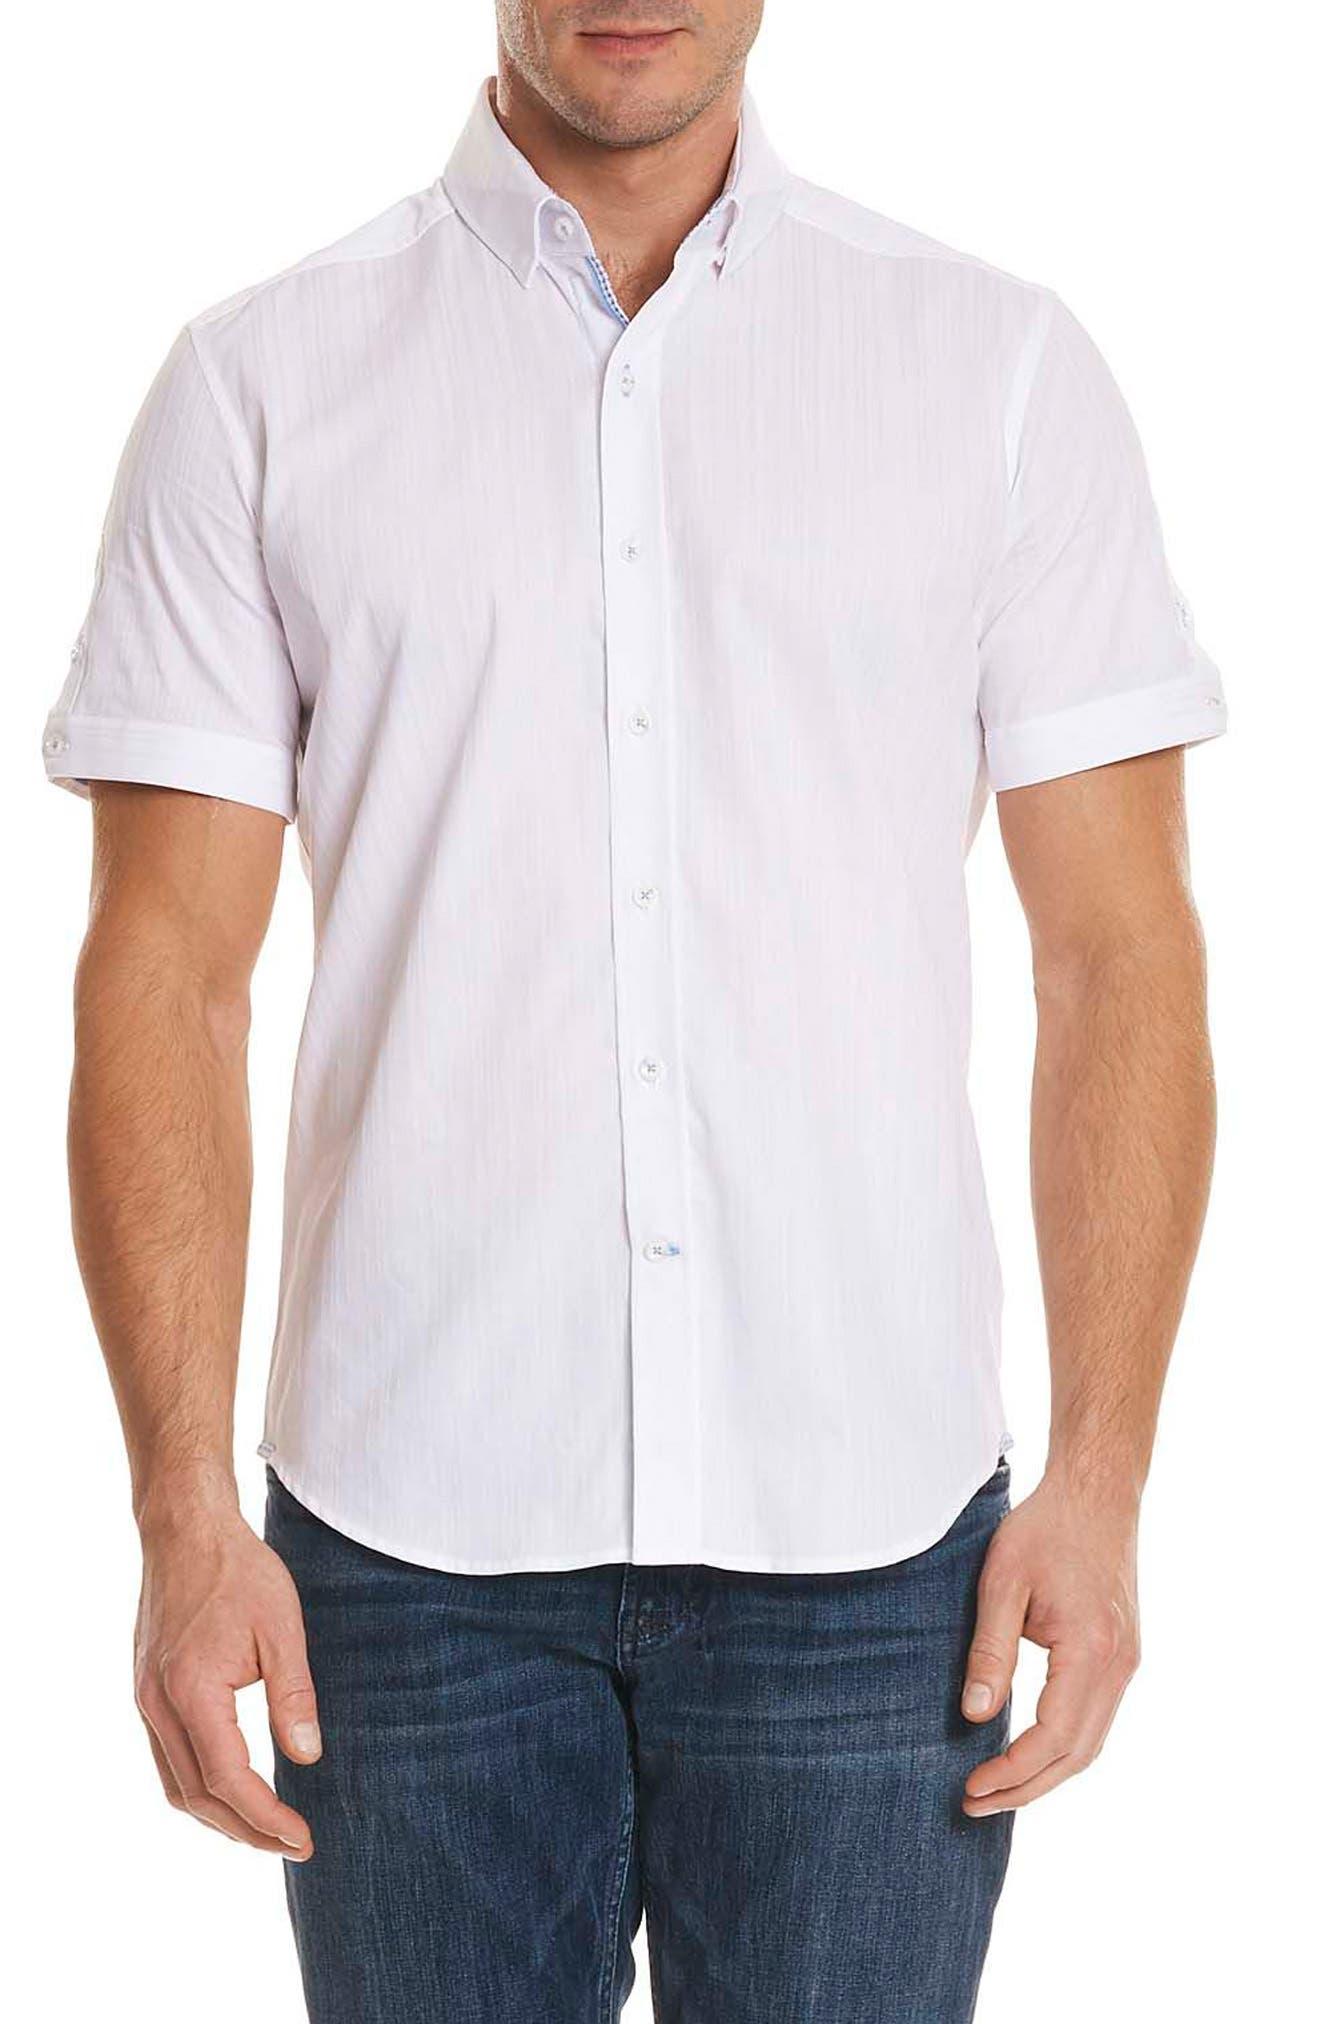 Livingston Regular Fit Short Sleeve Sport Shirt,                         Main,                         color, 100